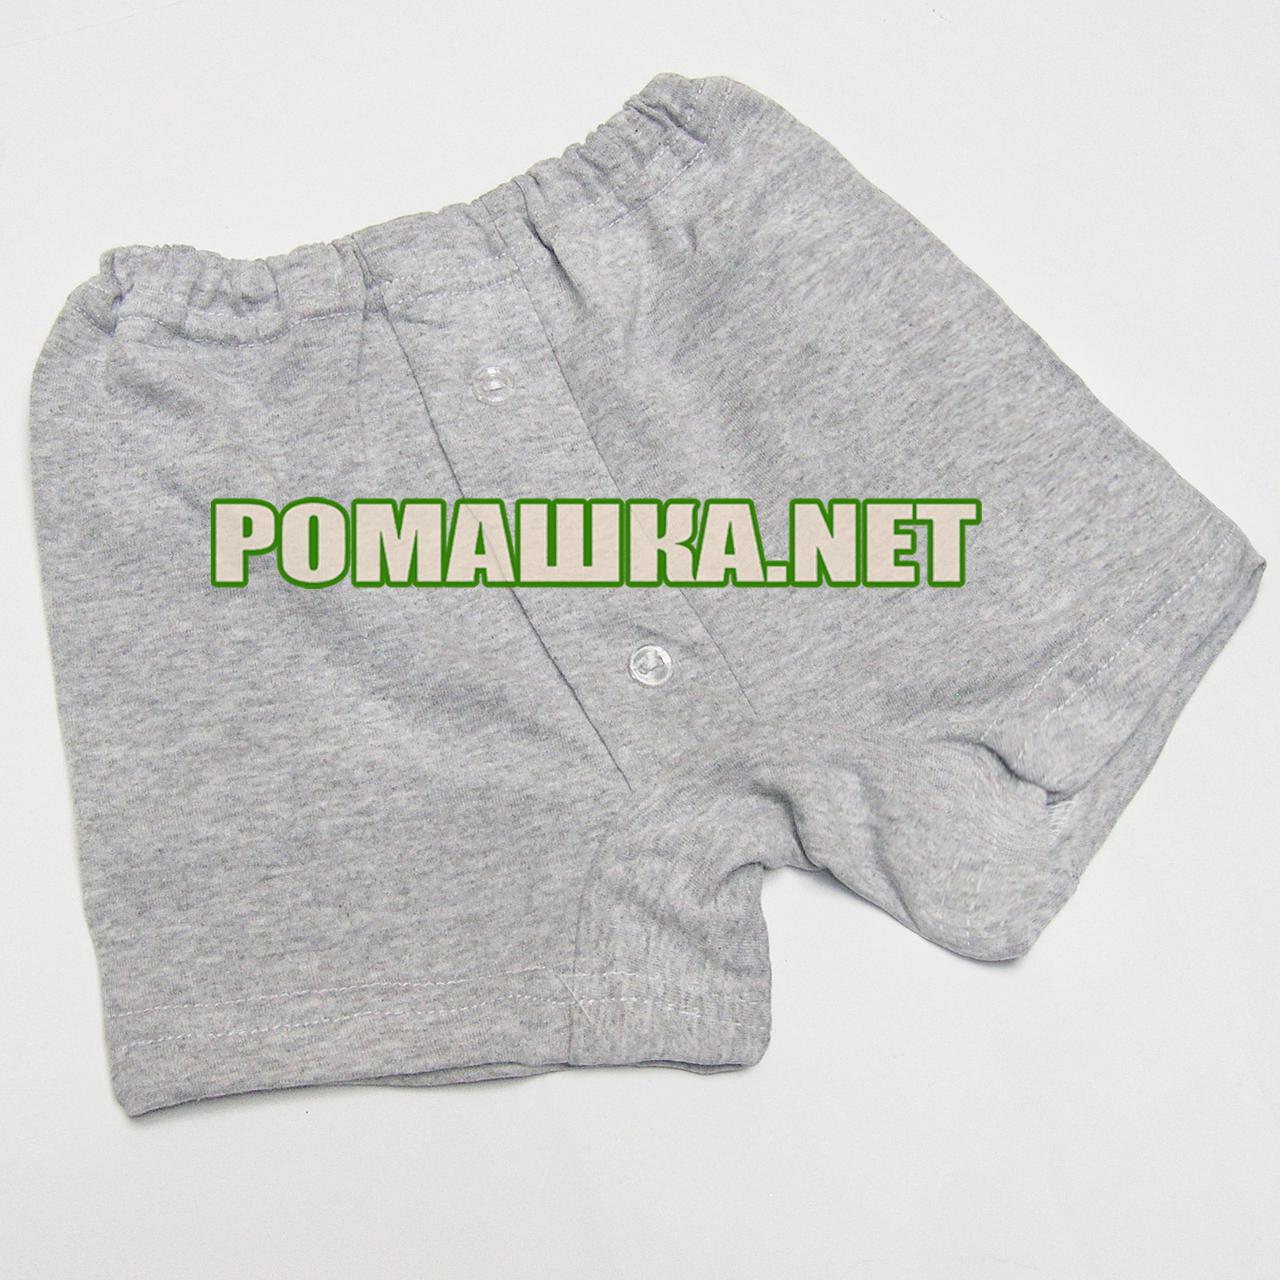 6b3b719745db6 110-116 для мальчика ткань КУЛИР 100% хлопок 3906 Серый 110, цена 36 грн.,  купить в Киеве — Prom.ua (ID#606993808)